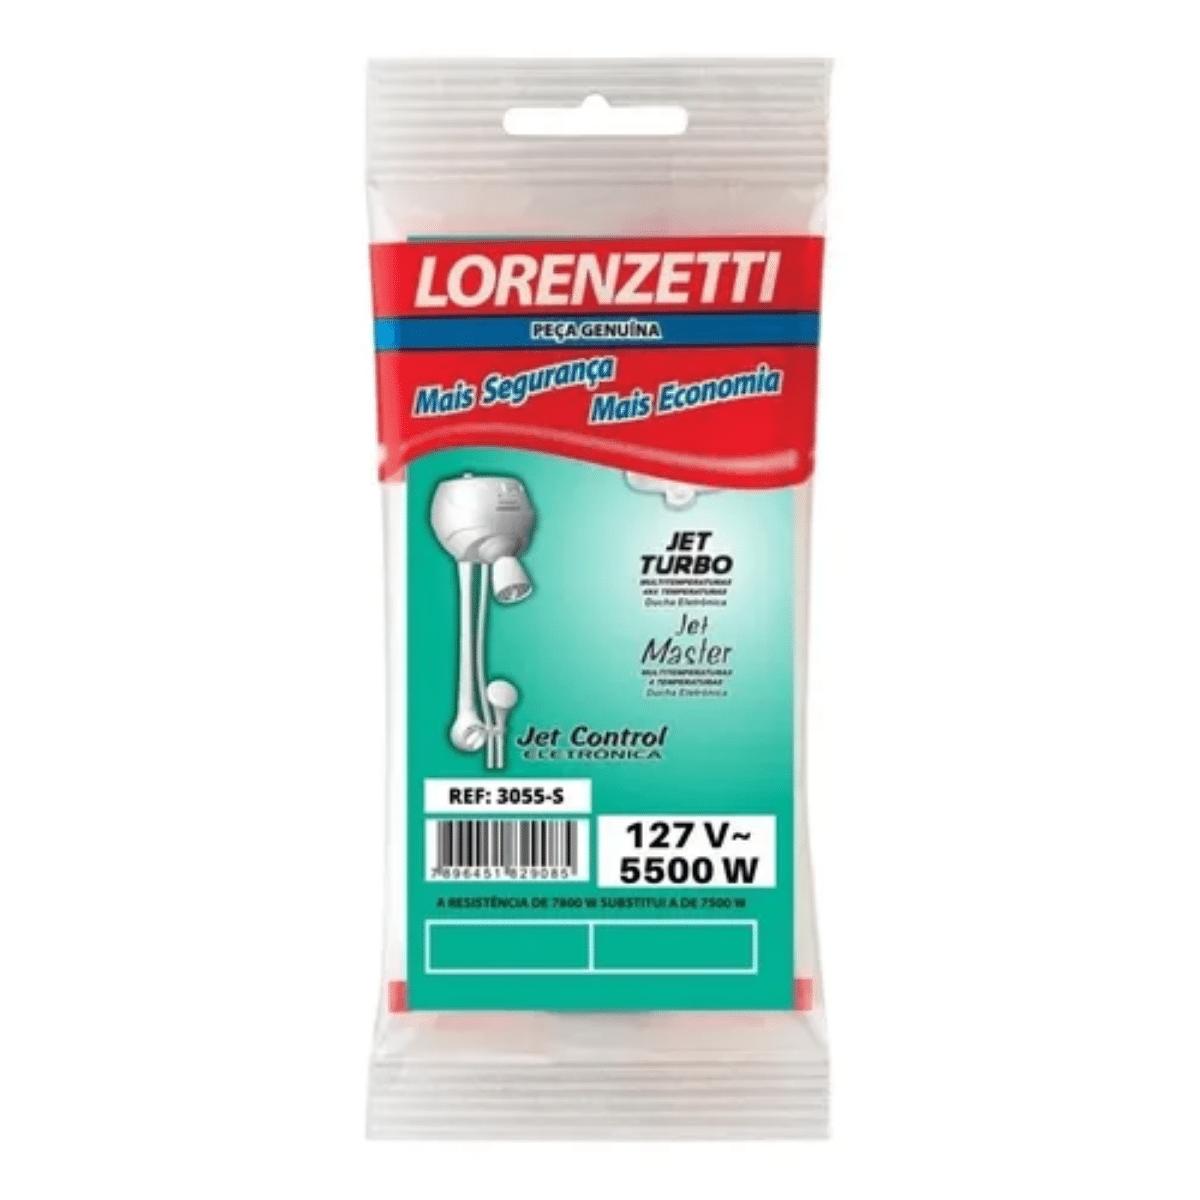 Resistencia Lorenzetti Jet Turbo e Jet Master 220v 7500w